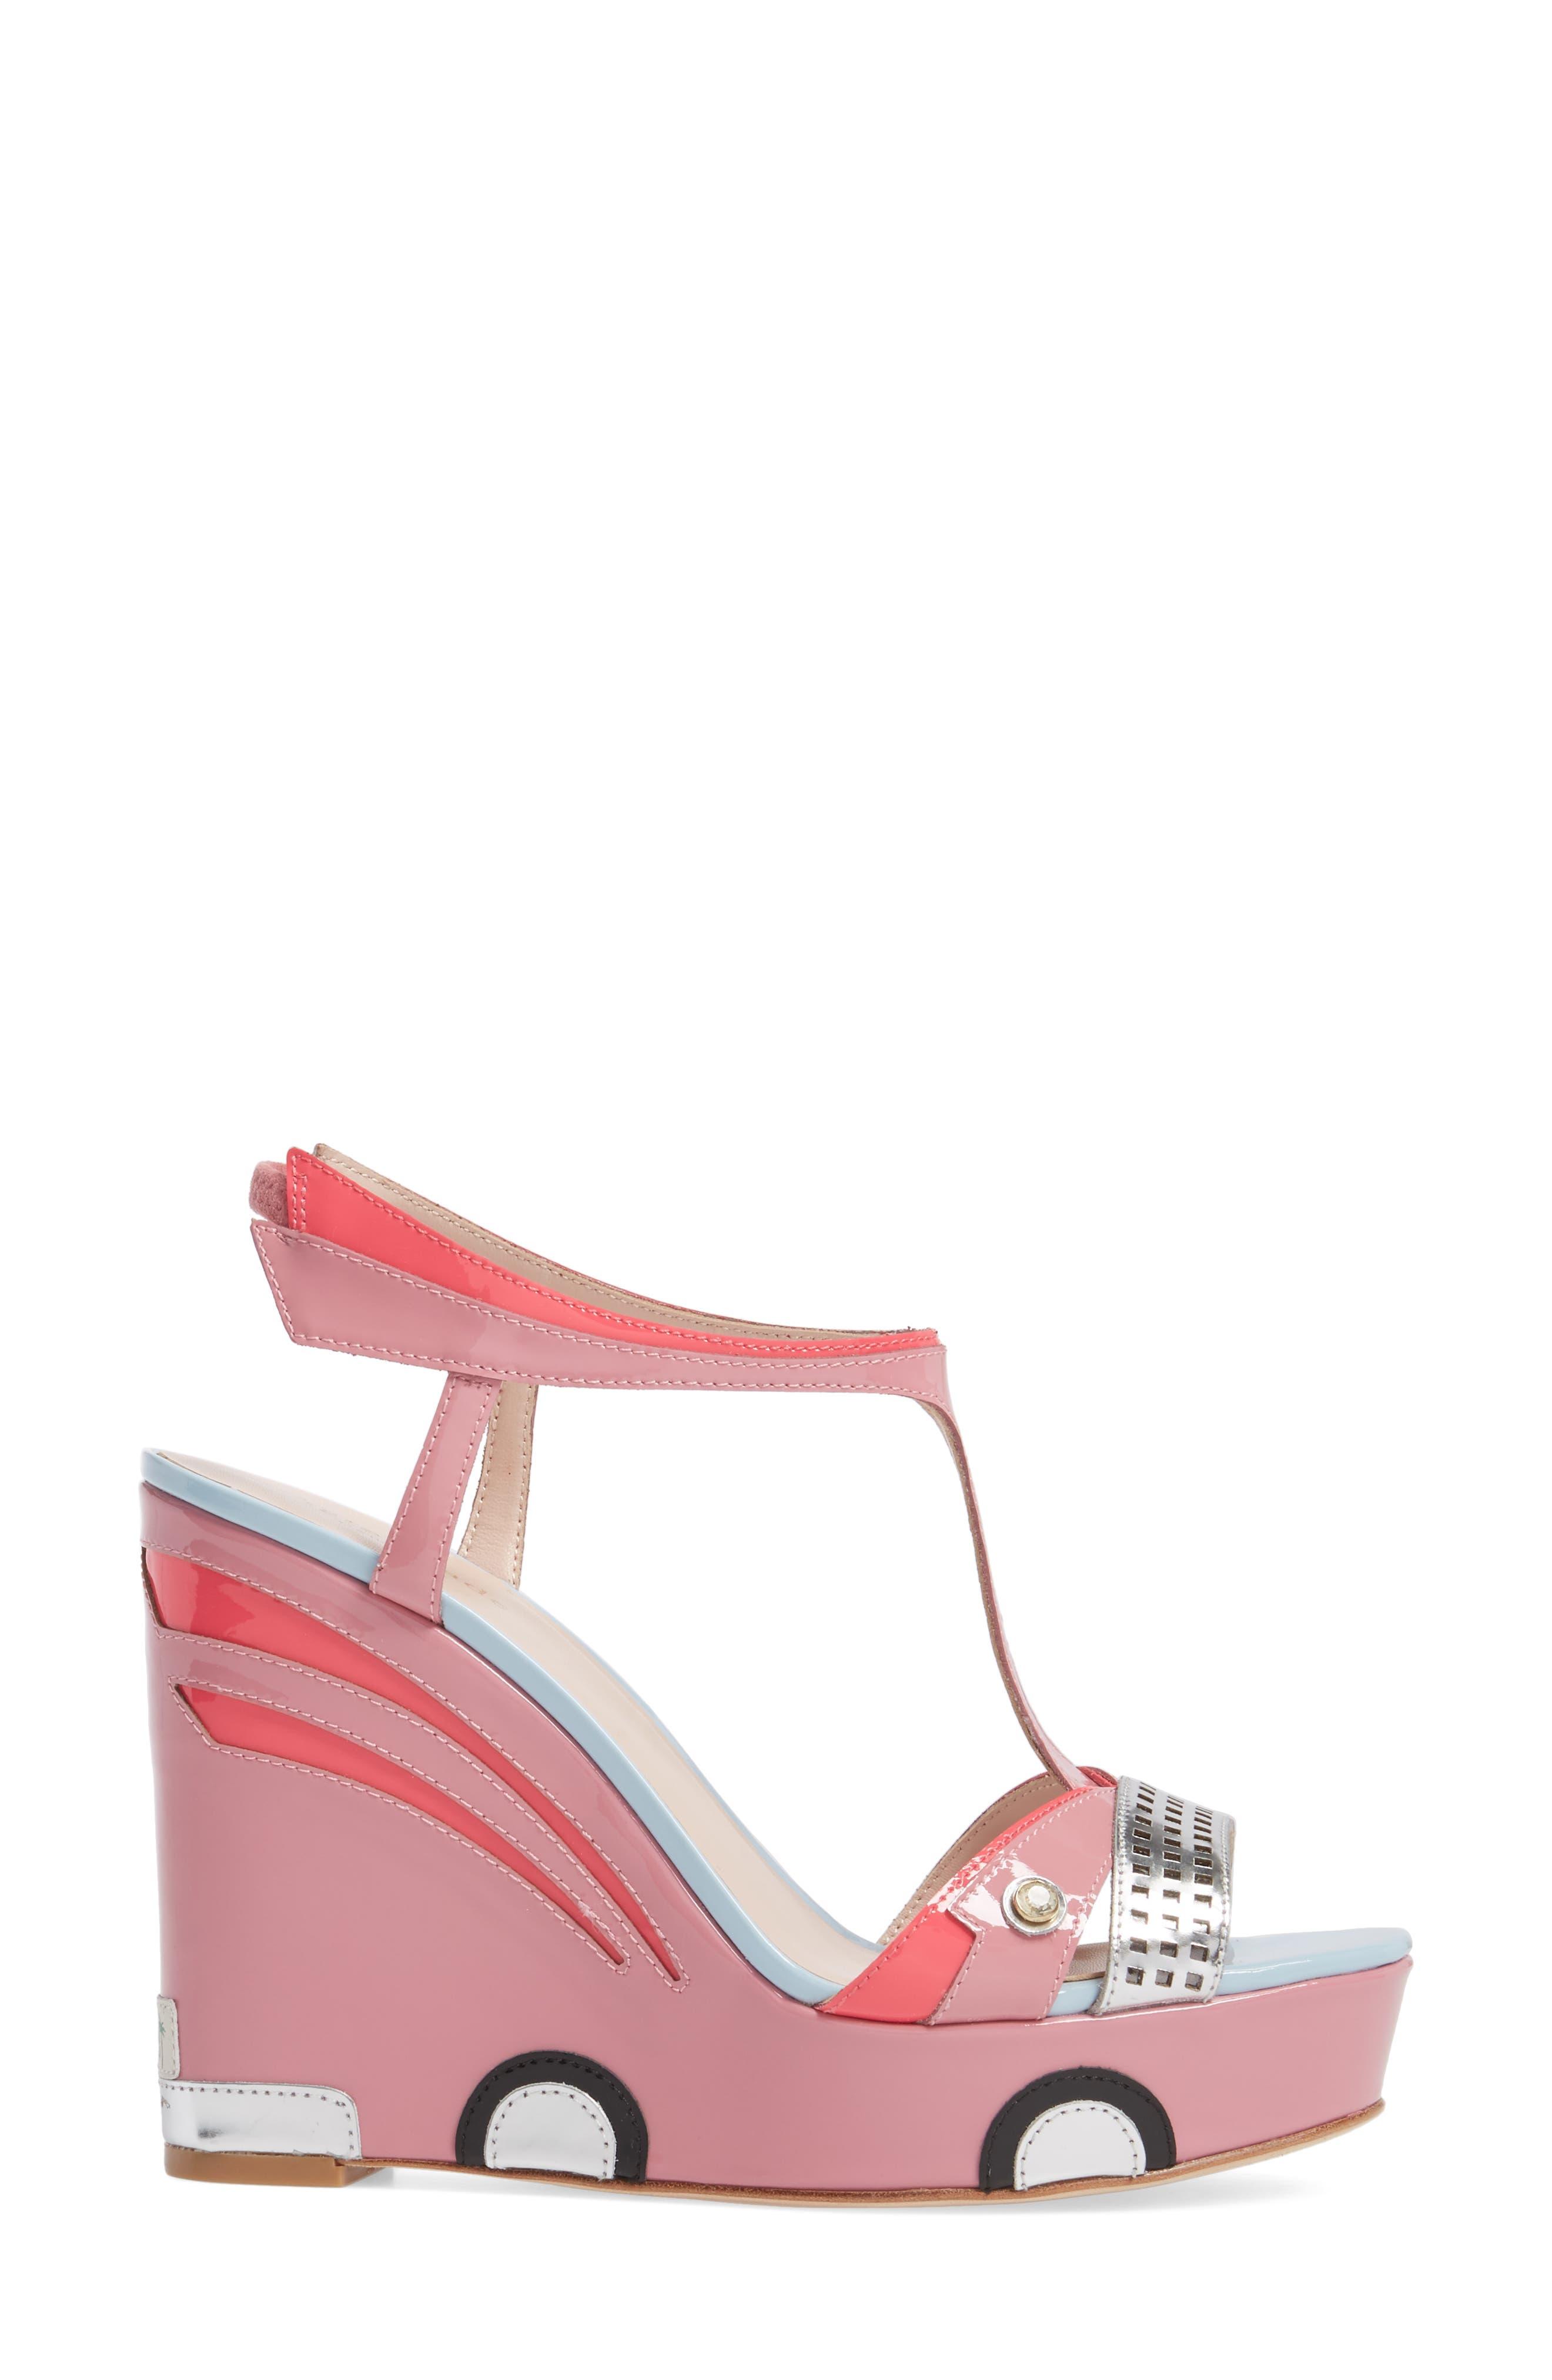 deanna wedge t-strap sandal,                             Alternate thumbnail 3, color,                             Petunia Patent